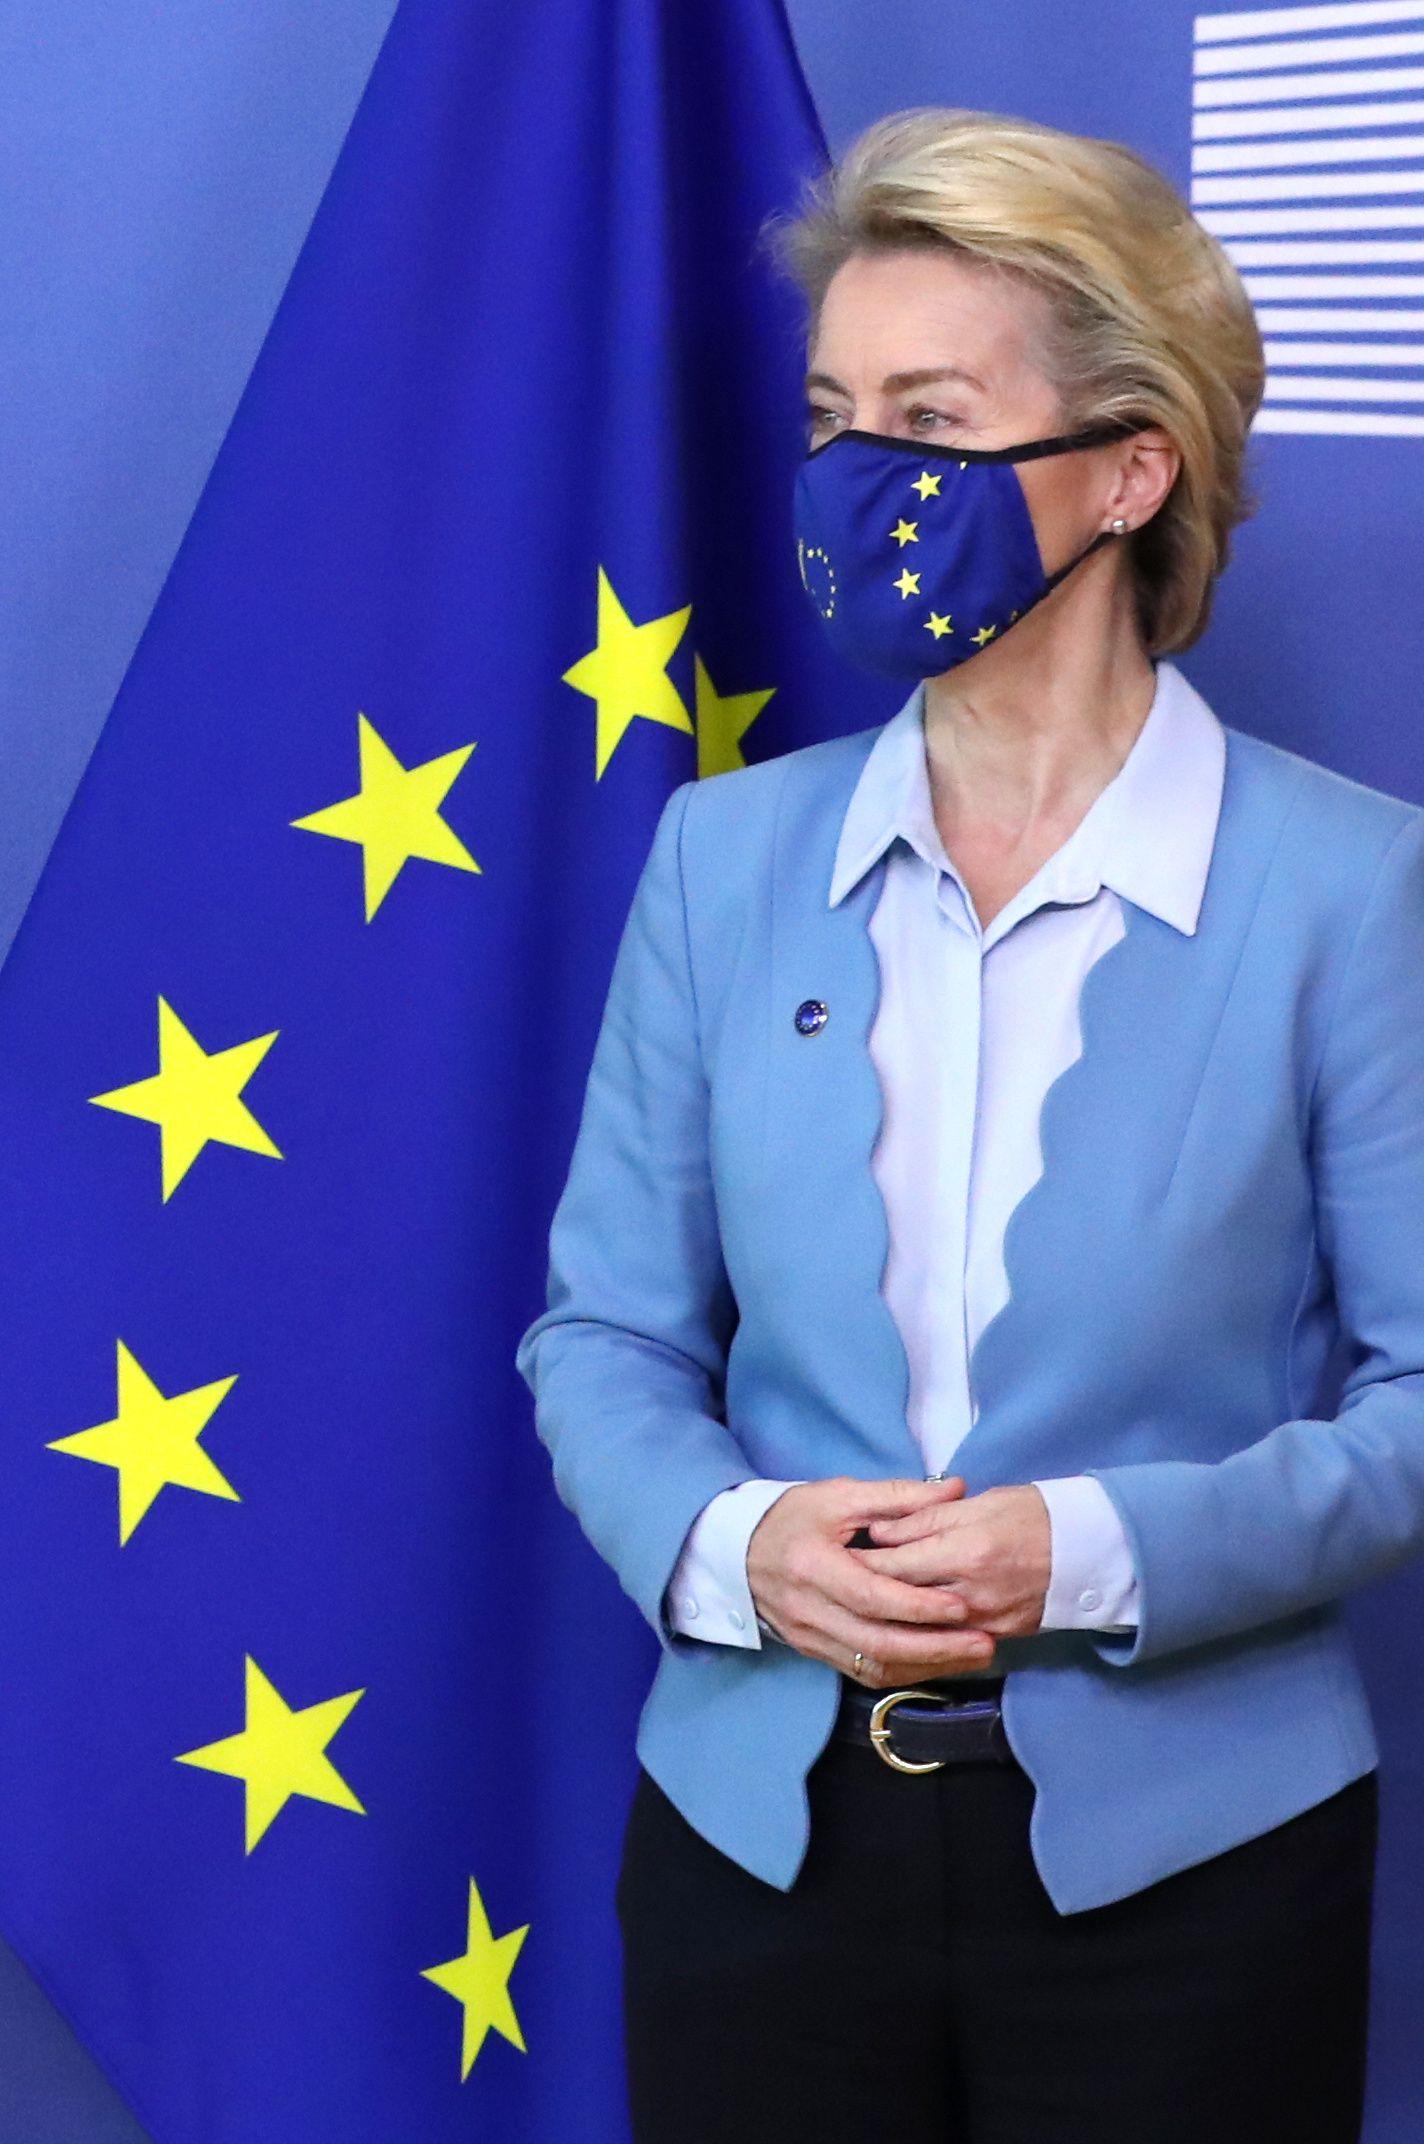 New Belgian PM De Croo is welcomed by EC President Ursula von der Leyen in Brussels